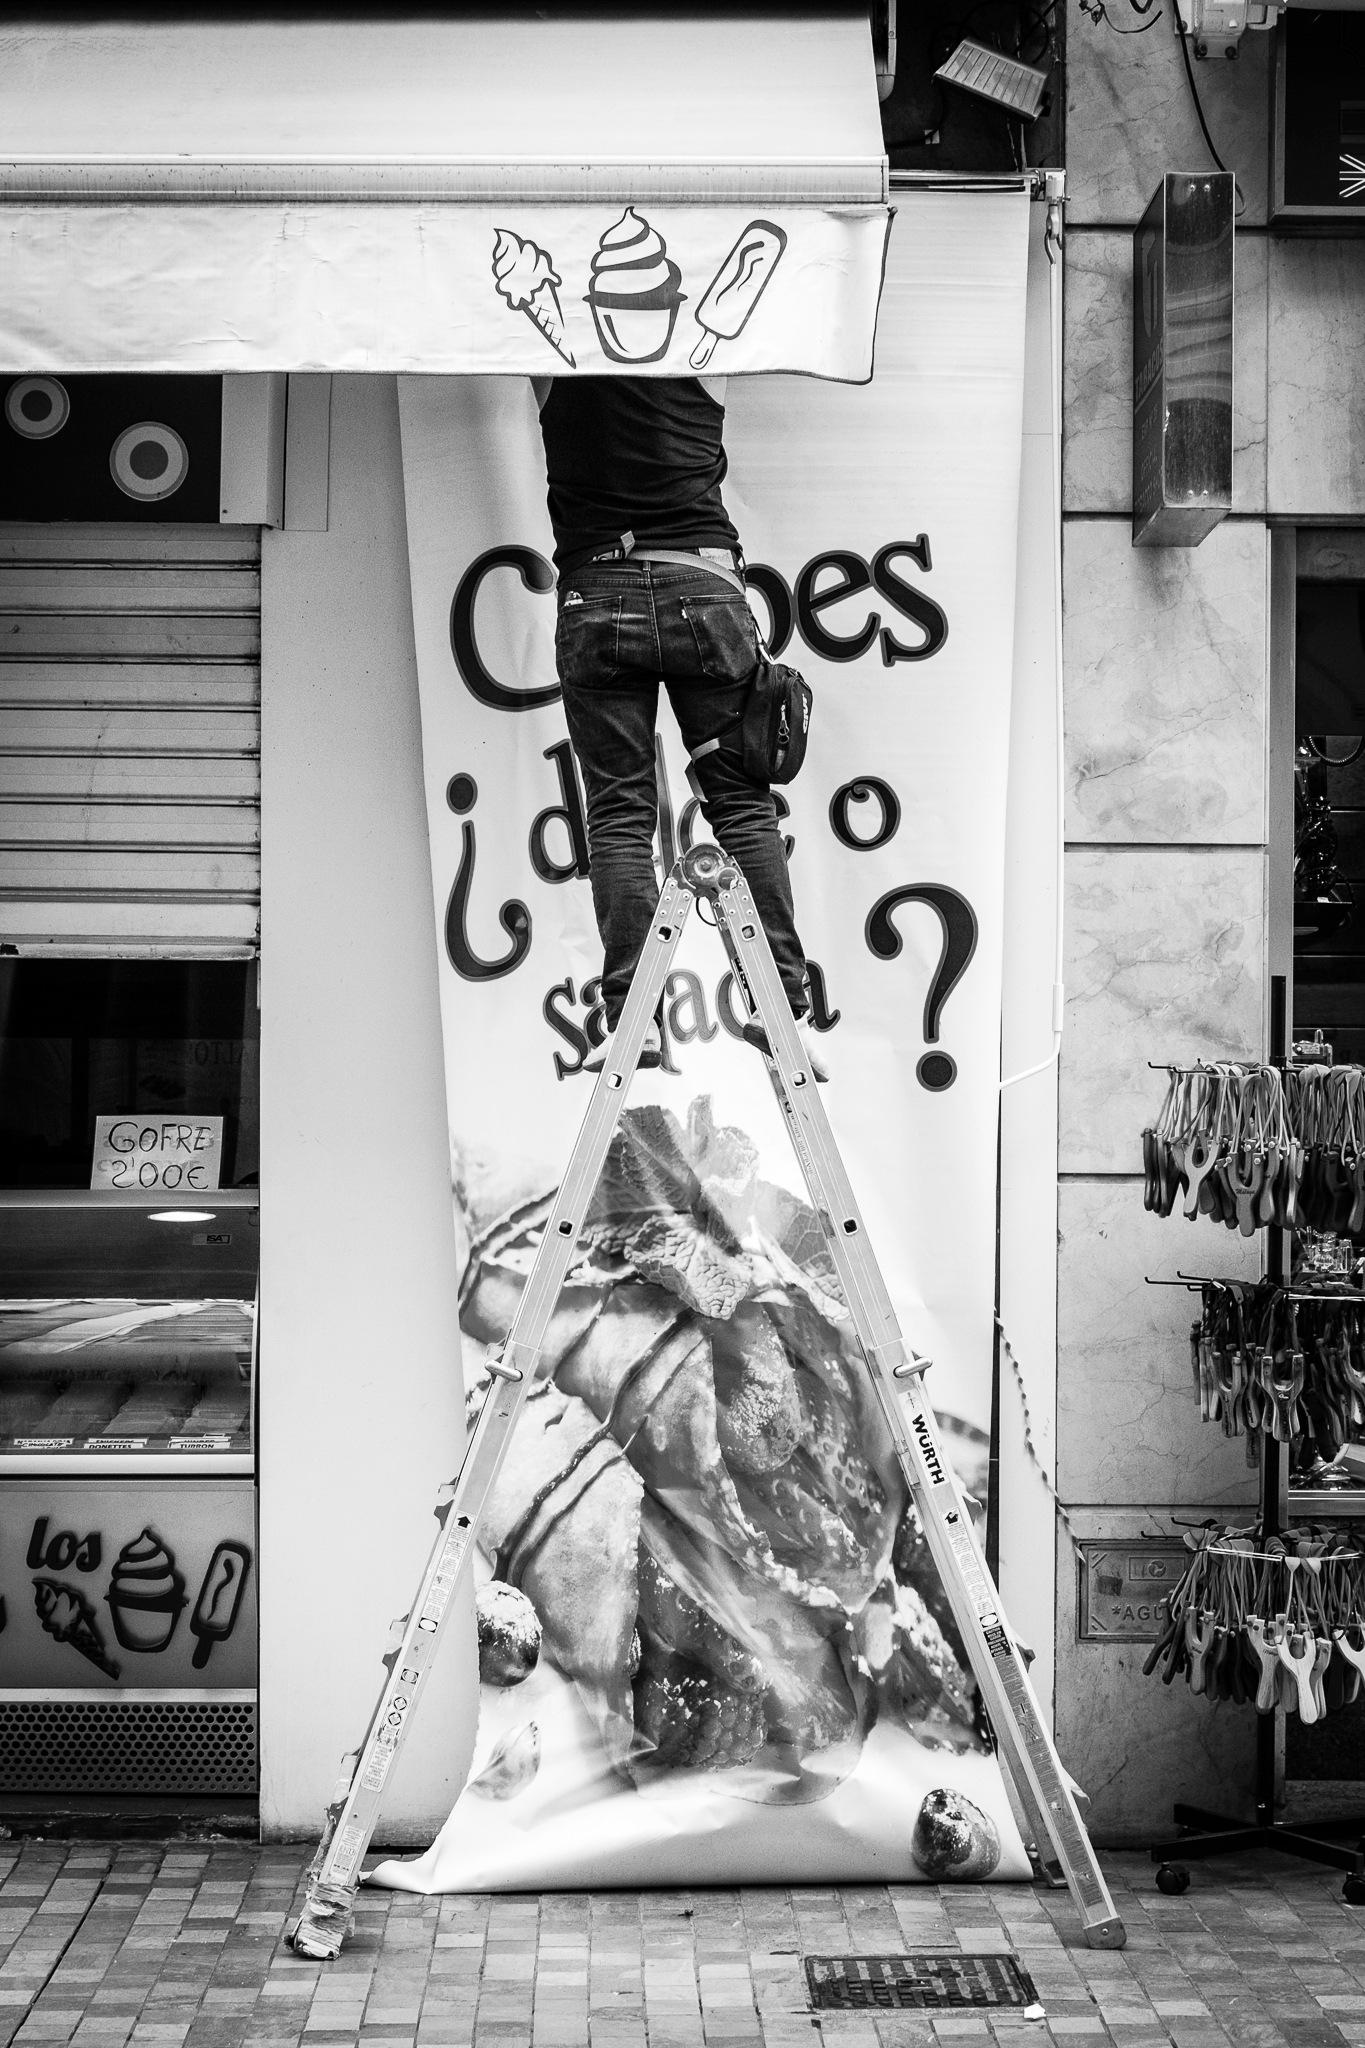 Untitled by Pepe Reyes